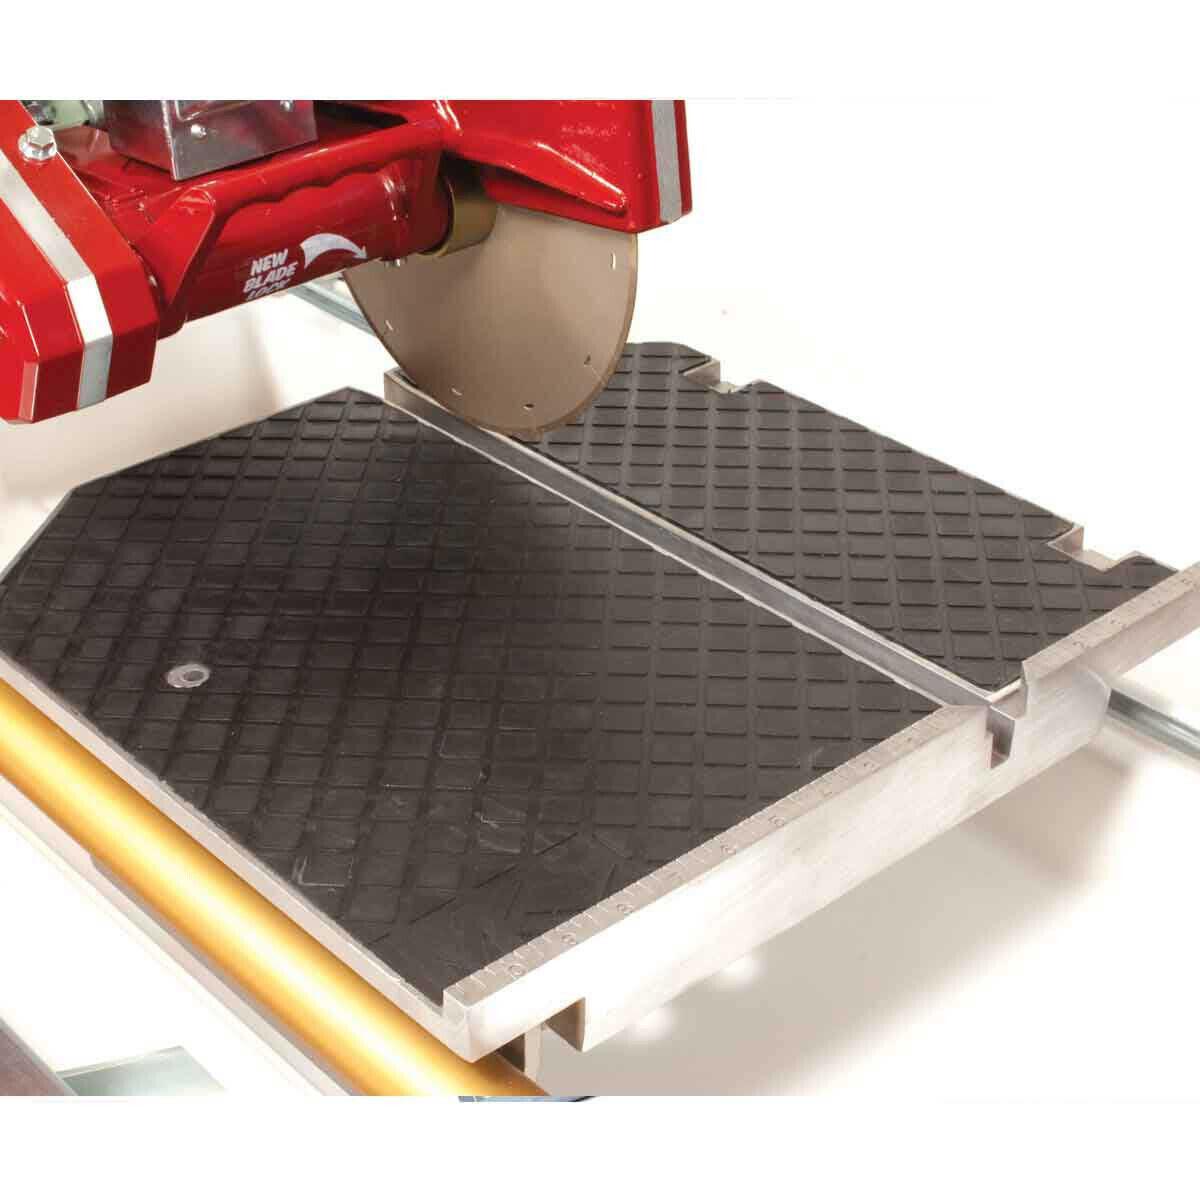 MK-101 tile saw try